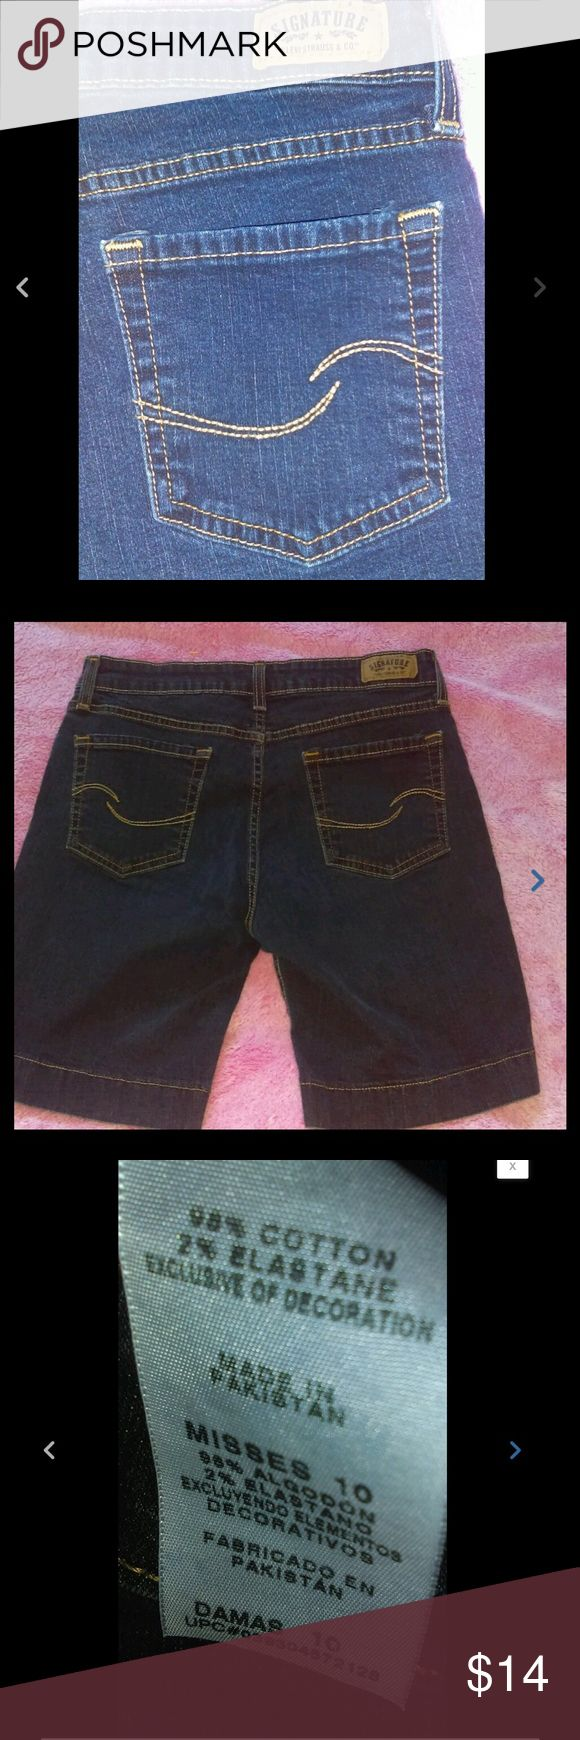 stretch dark wash denim Bermuda jeans shorts Levi's ladies size 10 stretch dark wash denim Bermuda jeans shorts Levi's Shorts Jean Shorts